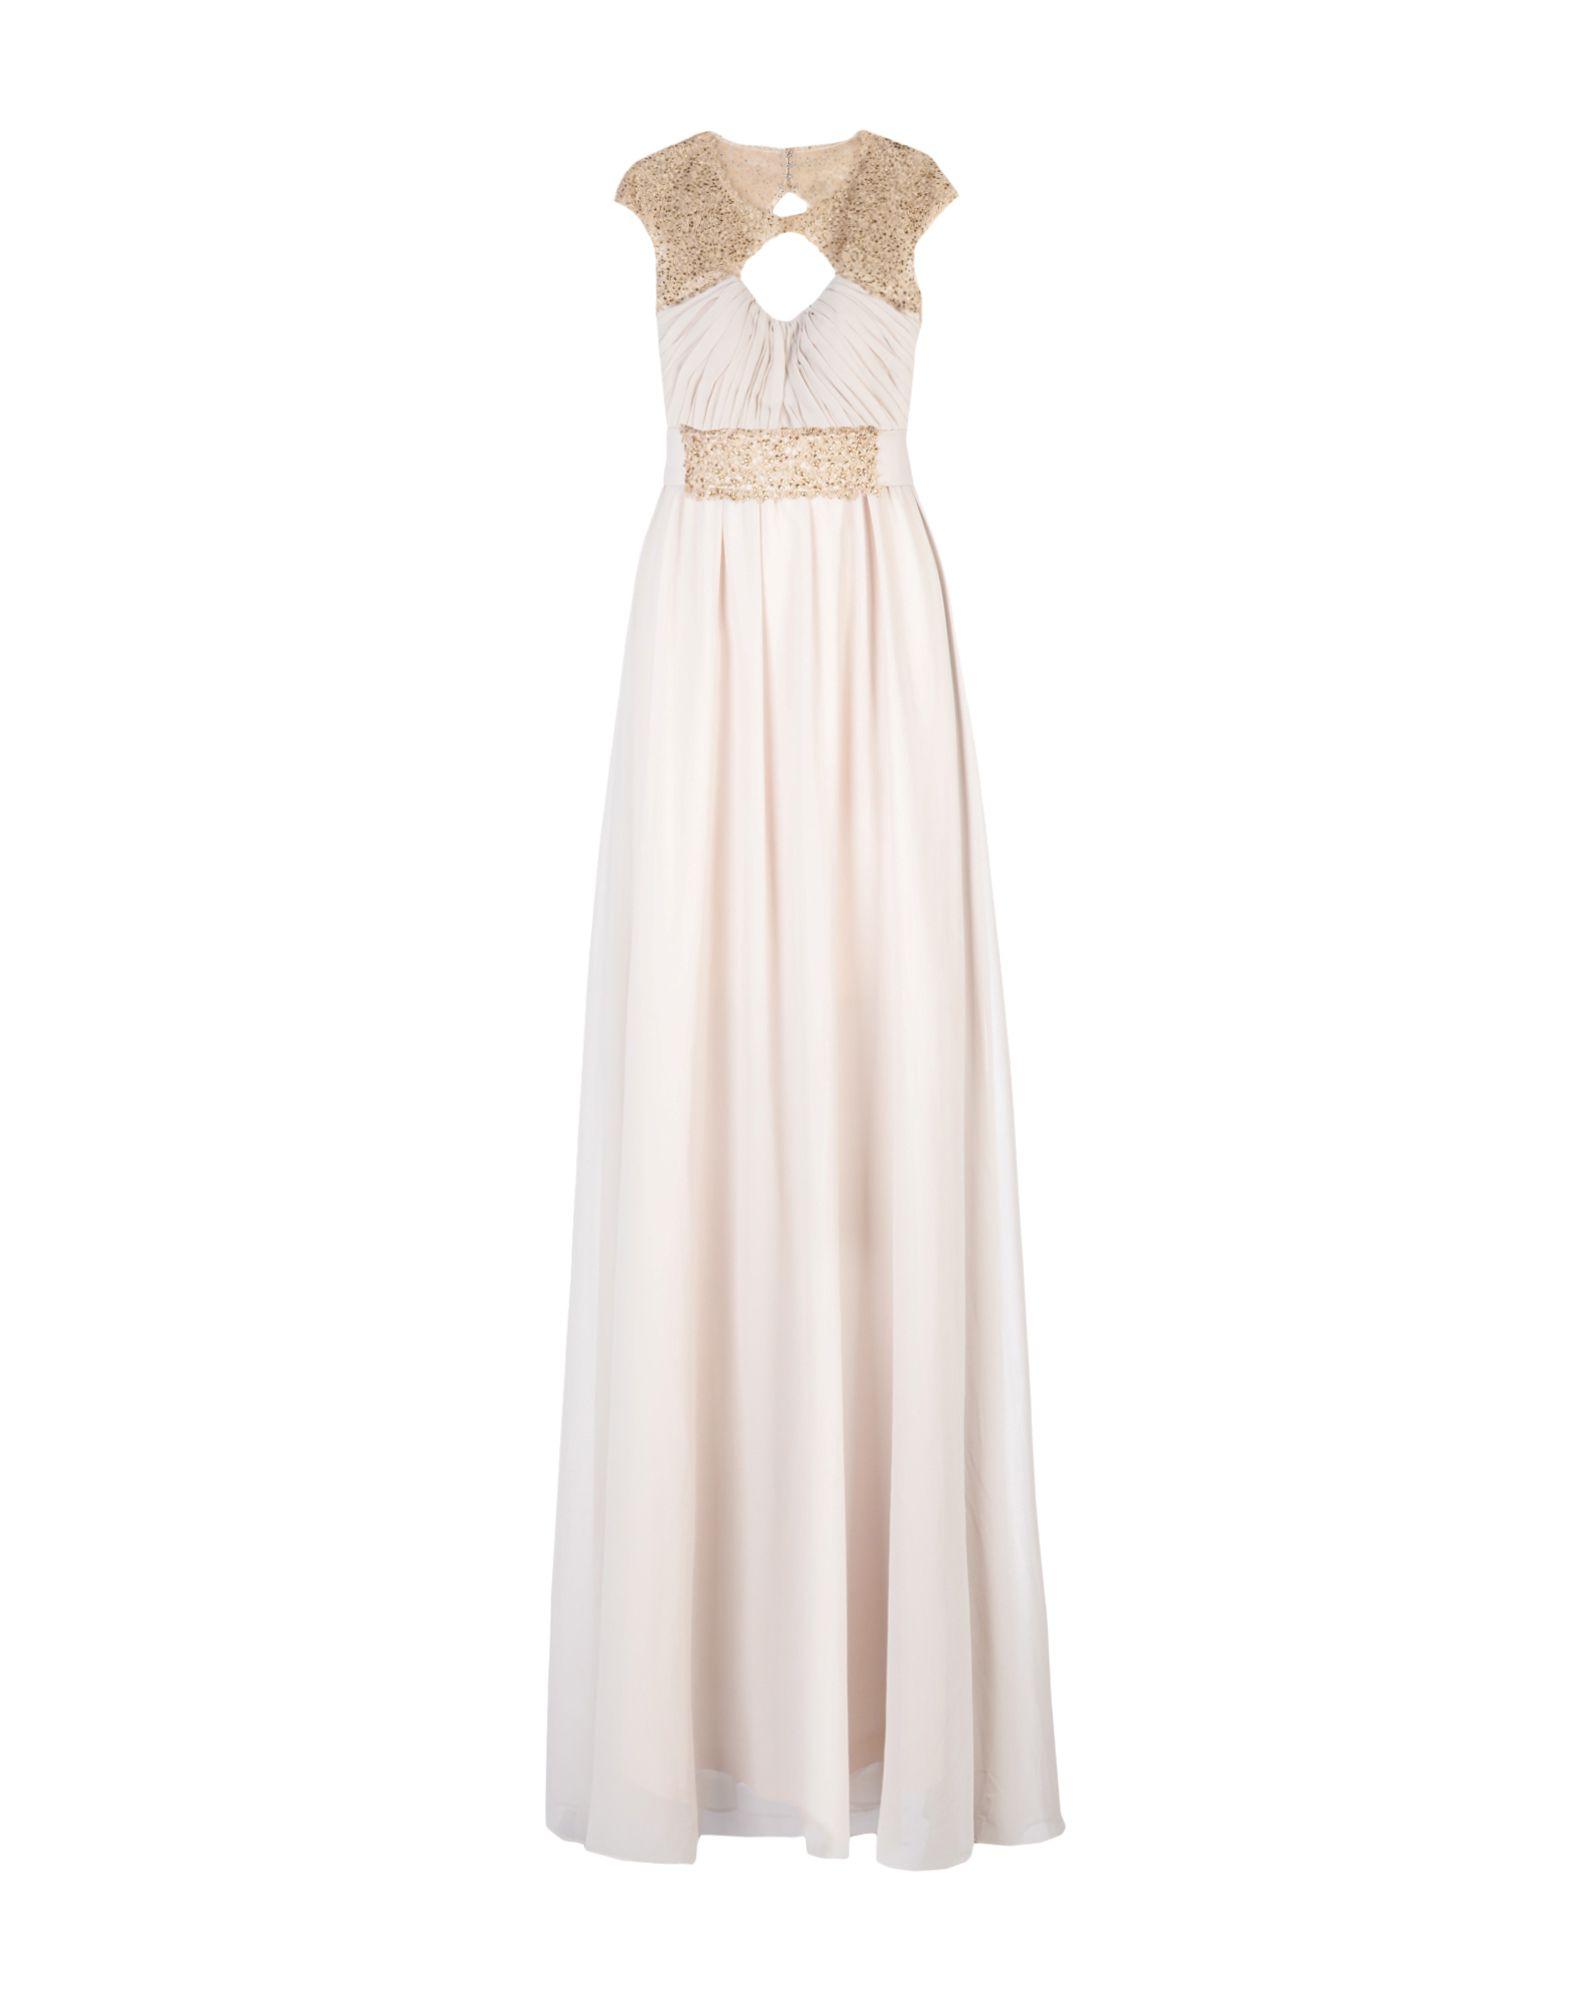 DRESSES - Long dresses Sologioie Unisex BfqlW2t